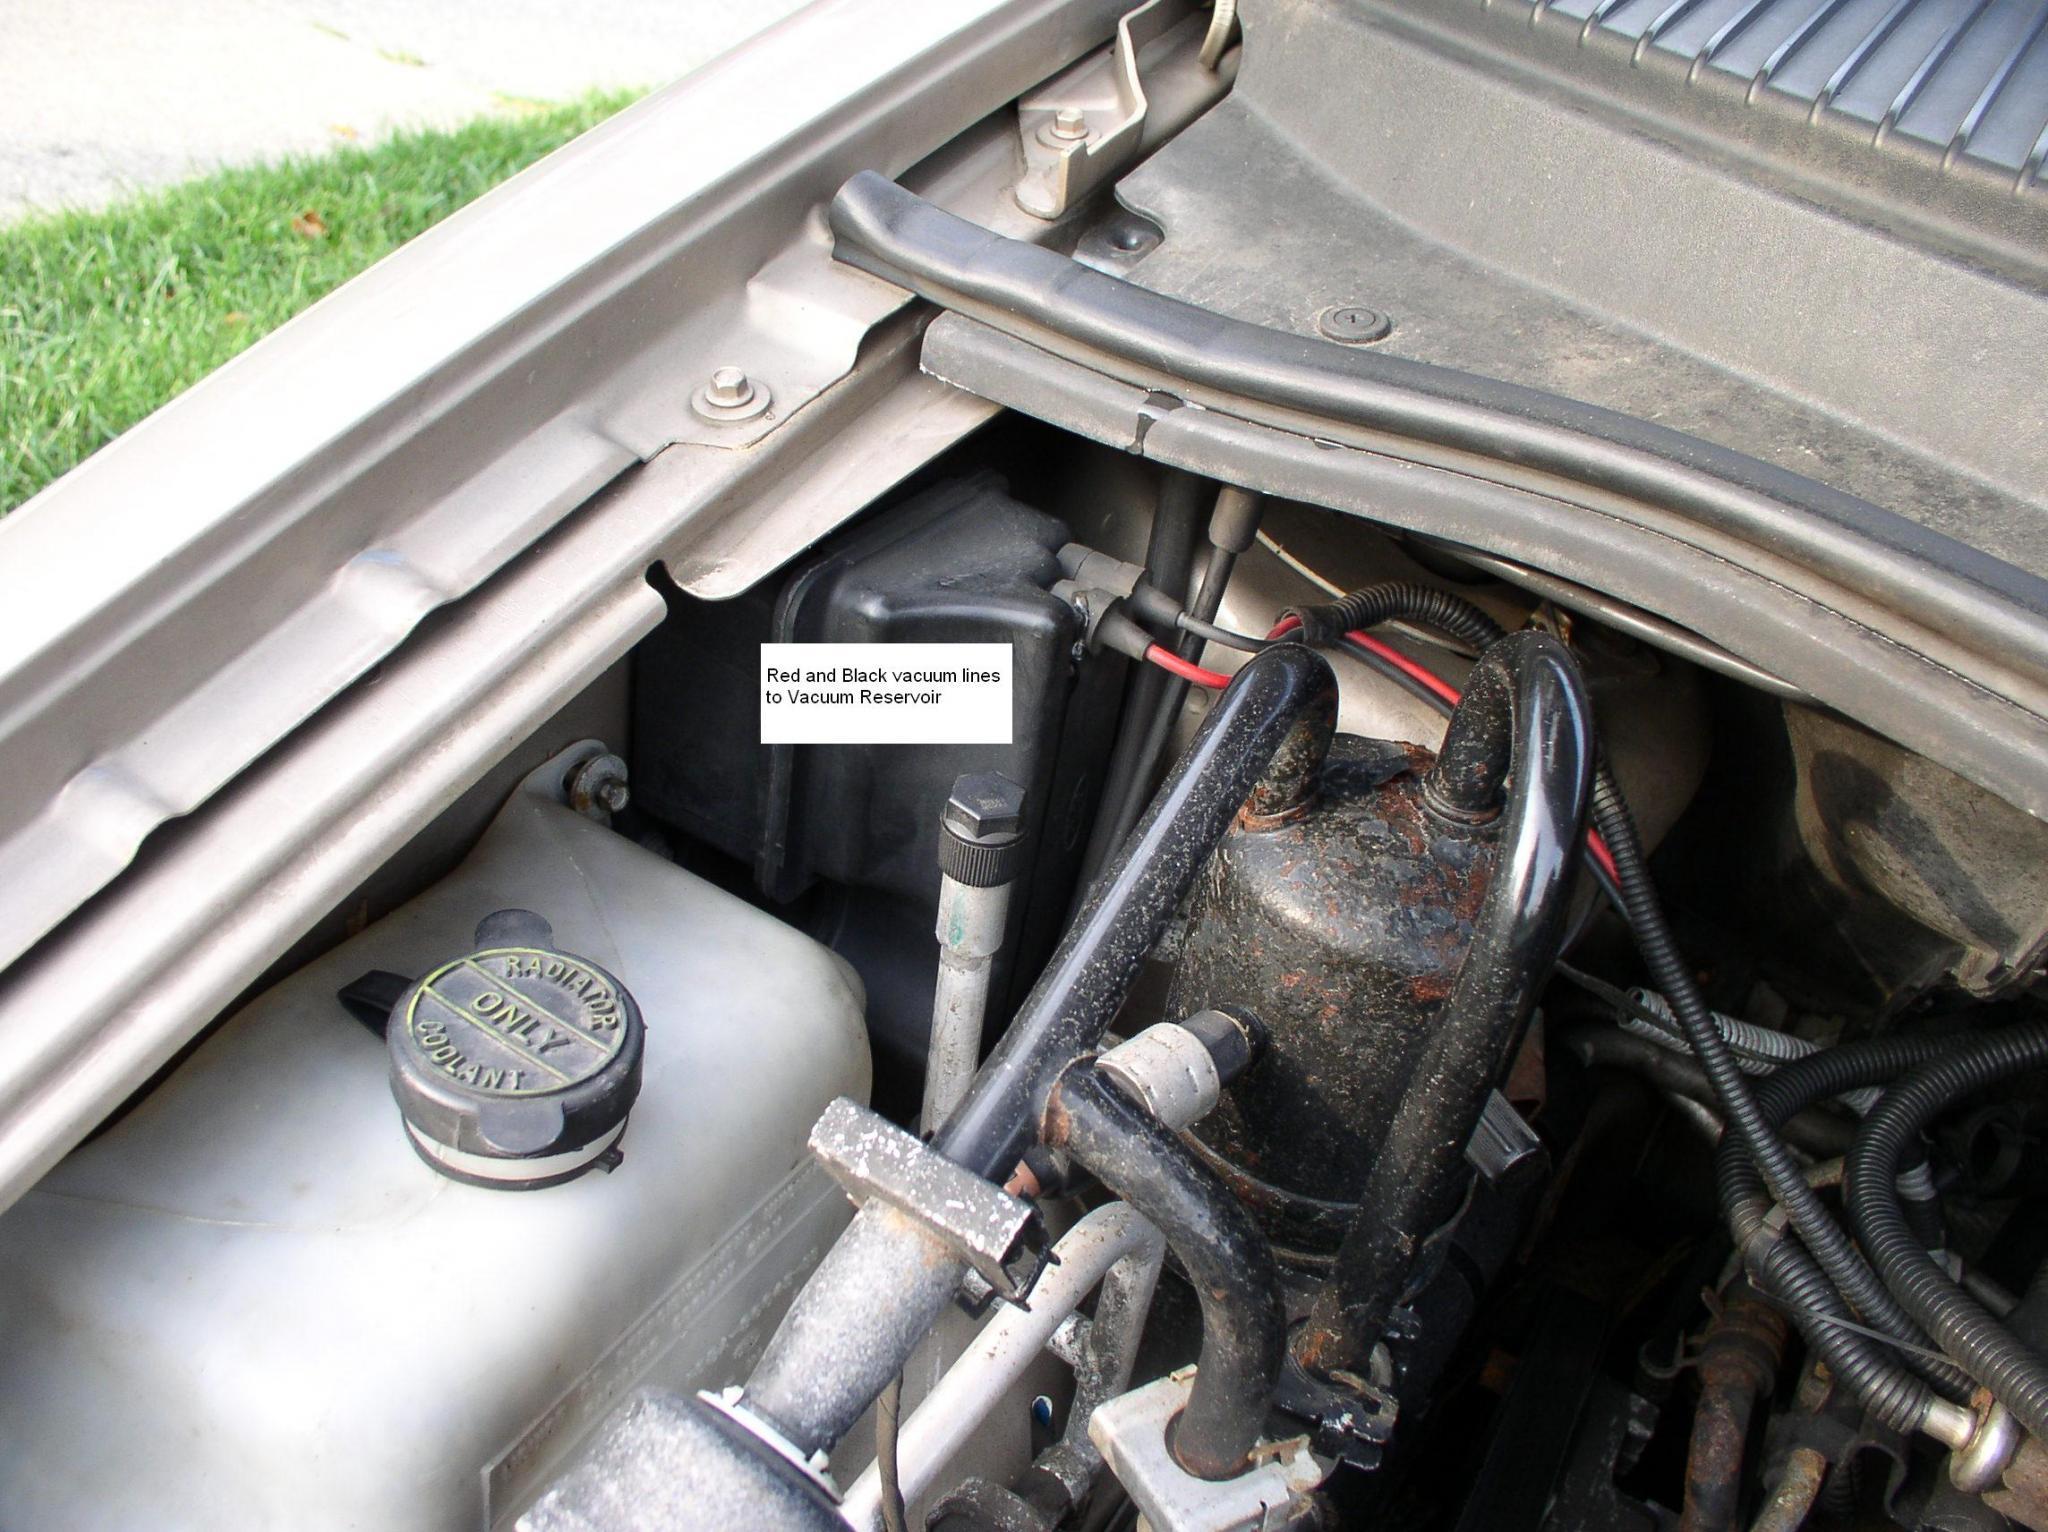 1998 Ford Windstar Engine Vacuum Diagram Wiring Diagram System Glow Image Glow Image Ediliadesign It